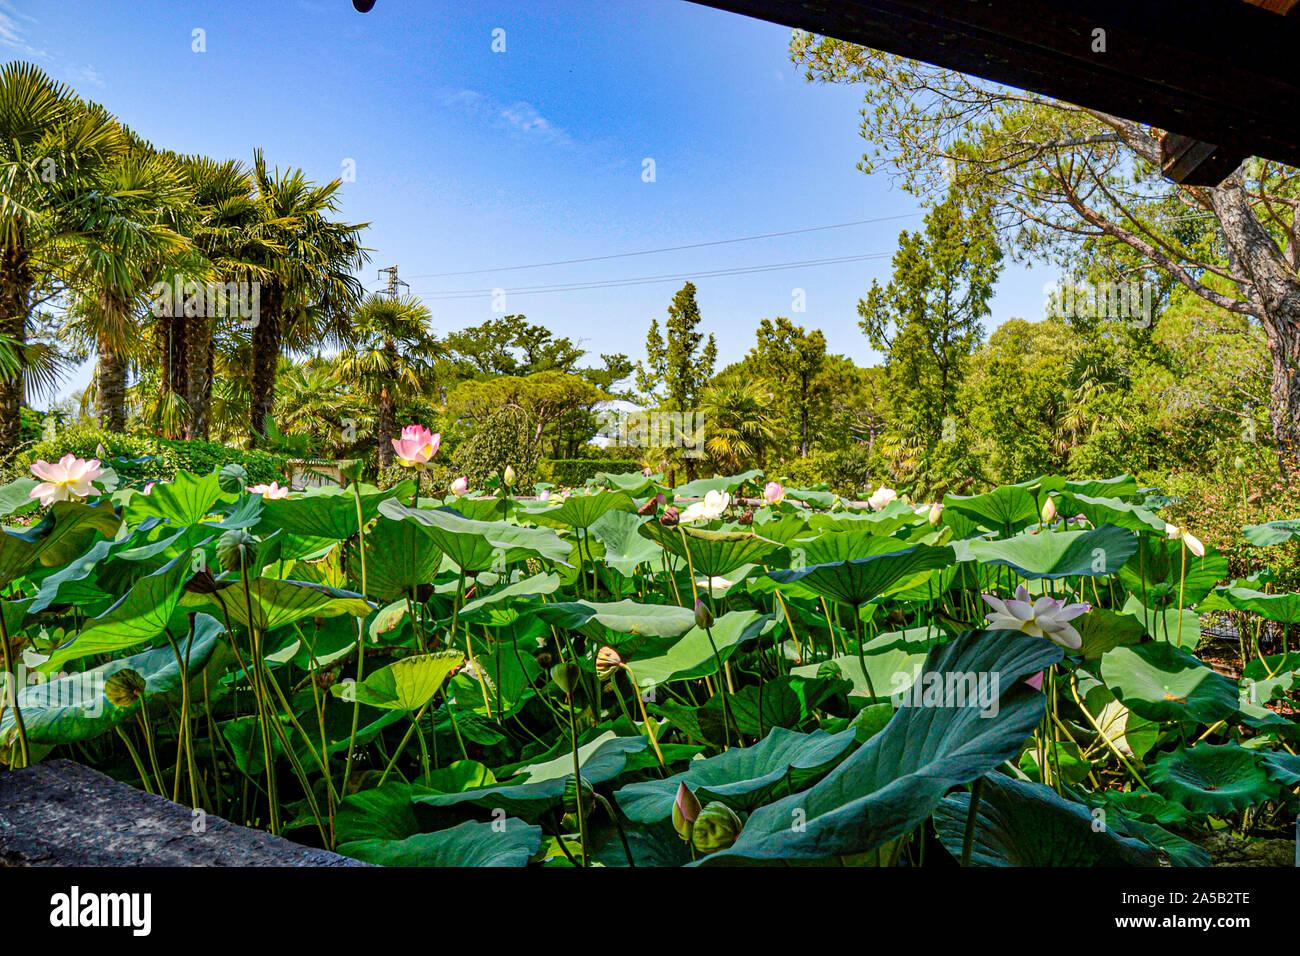 Seerosen/im Zoo Punta Verde in Lignano (Italien)/Tierpark in Lignano/Sehenswürdigkeit in Lignano (Italien) Stockfoto